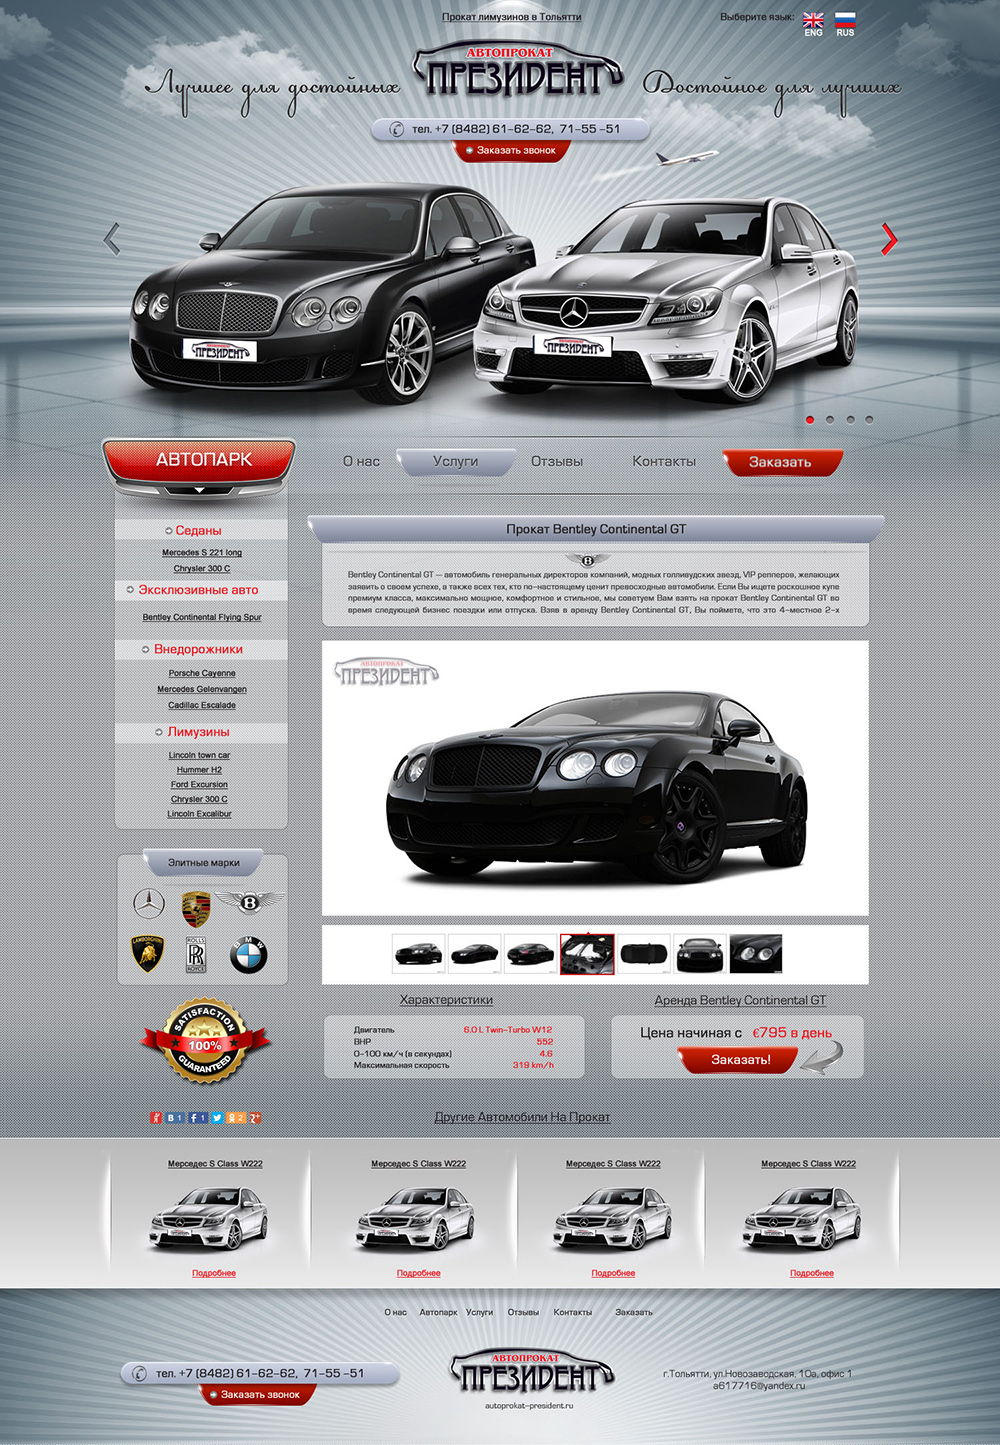 Дизайн сайти Президент